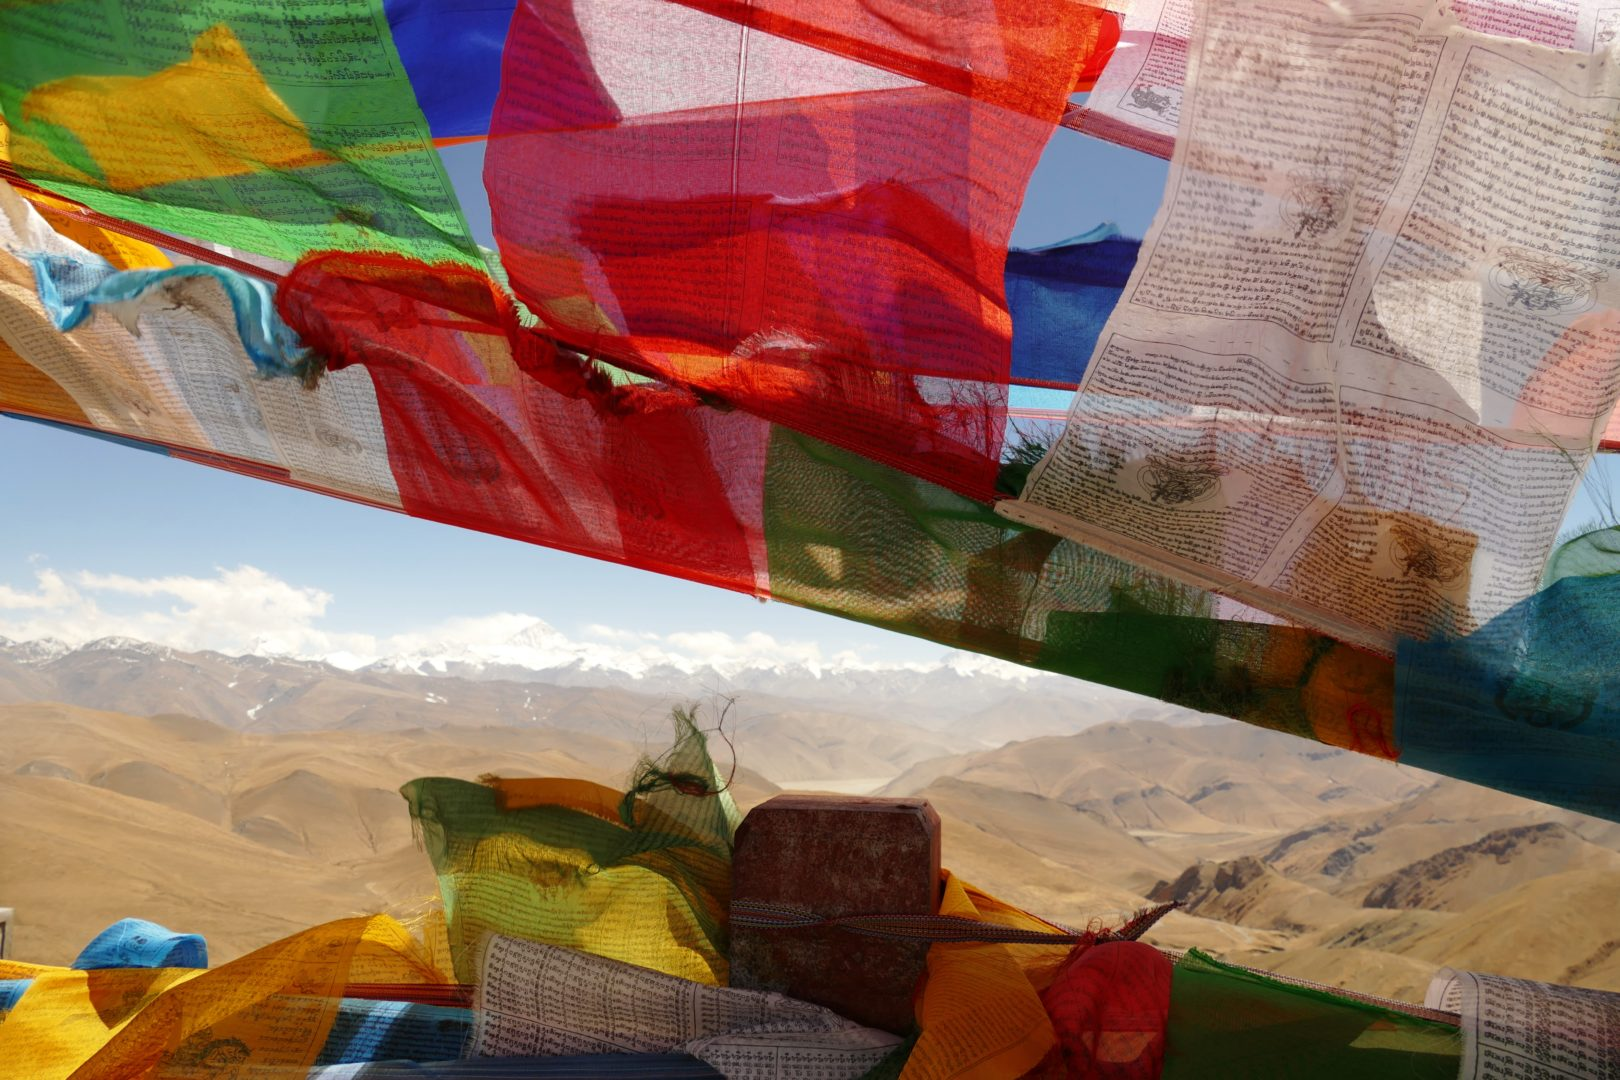 La catena himalayana avvolta dalle bandierine tibetane